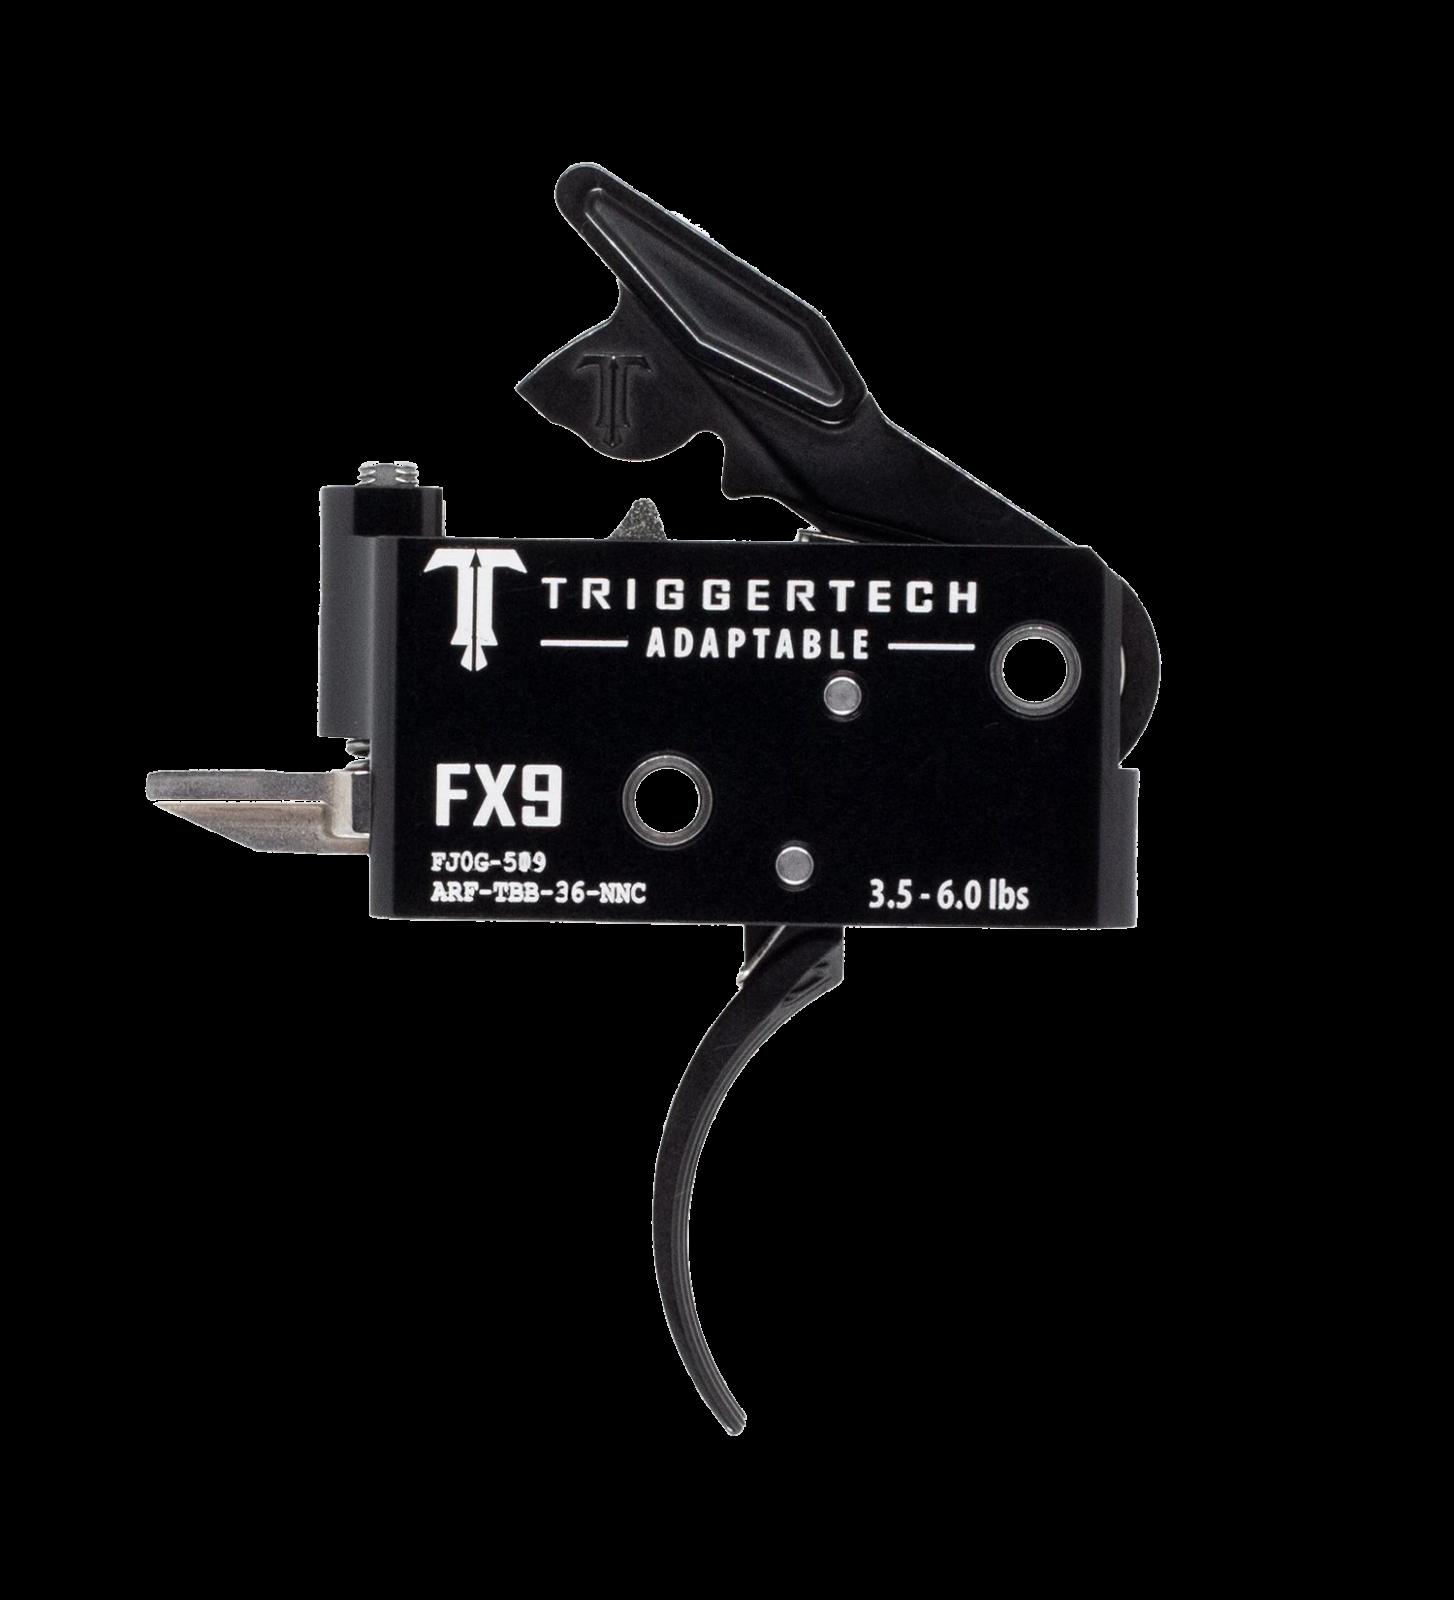 Spoušť TriggerTech FX9 Adaptable - zaoblená, černá